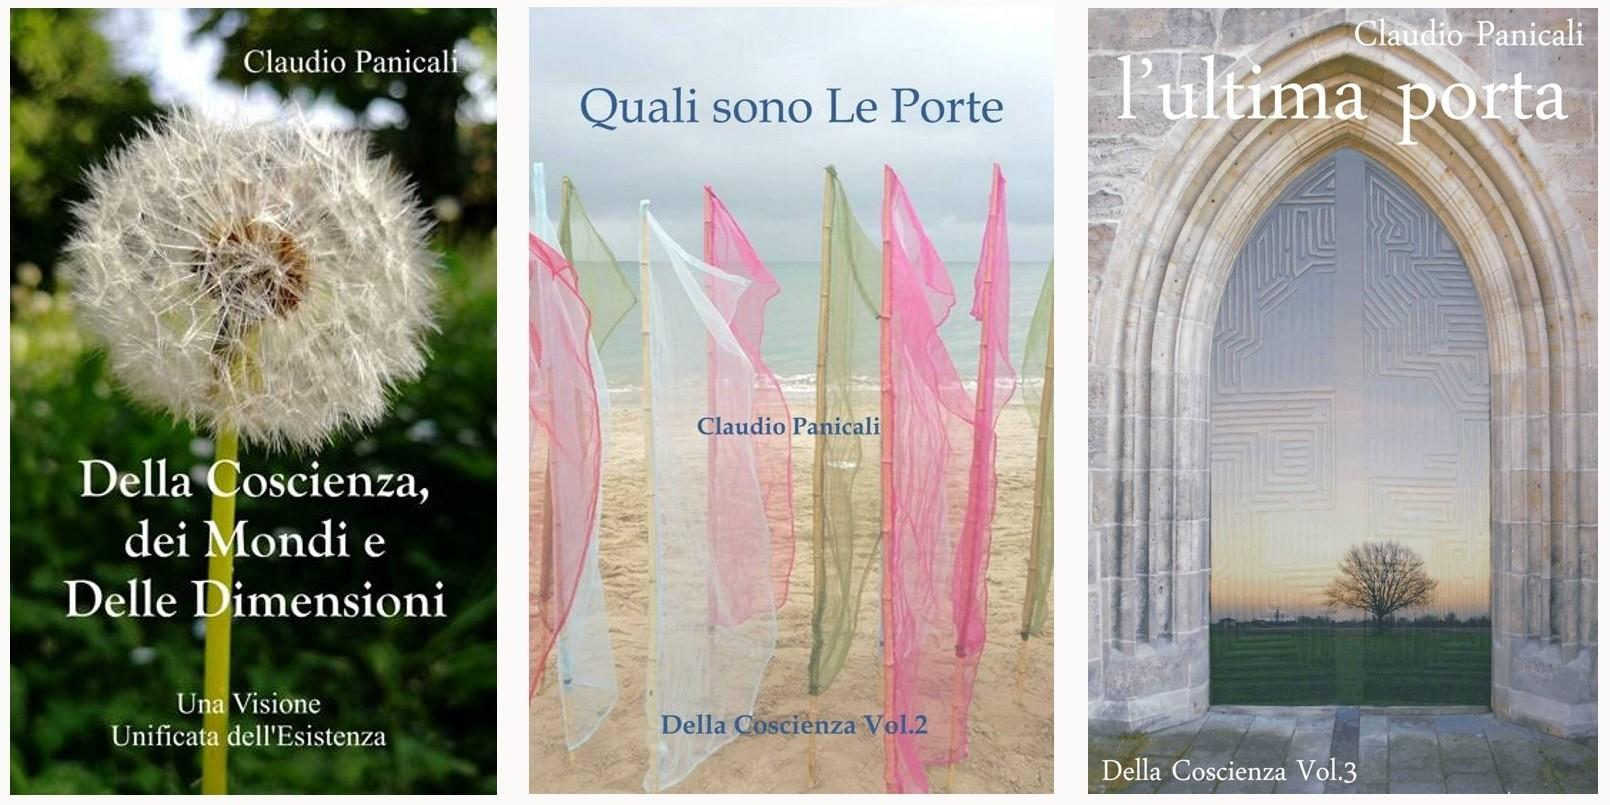 Cpertina Della Coscienza Vol1 2 3jpg